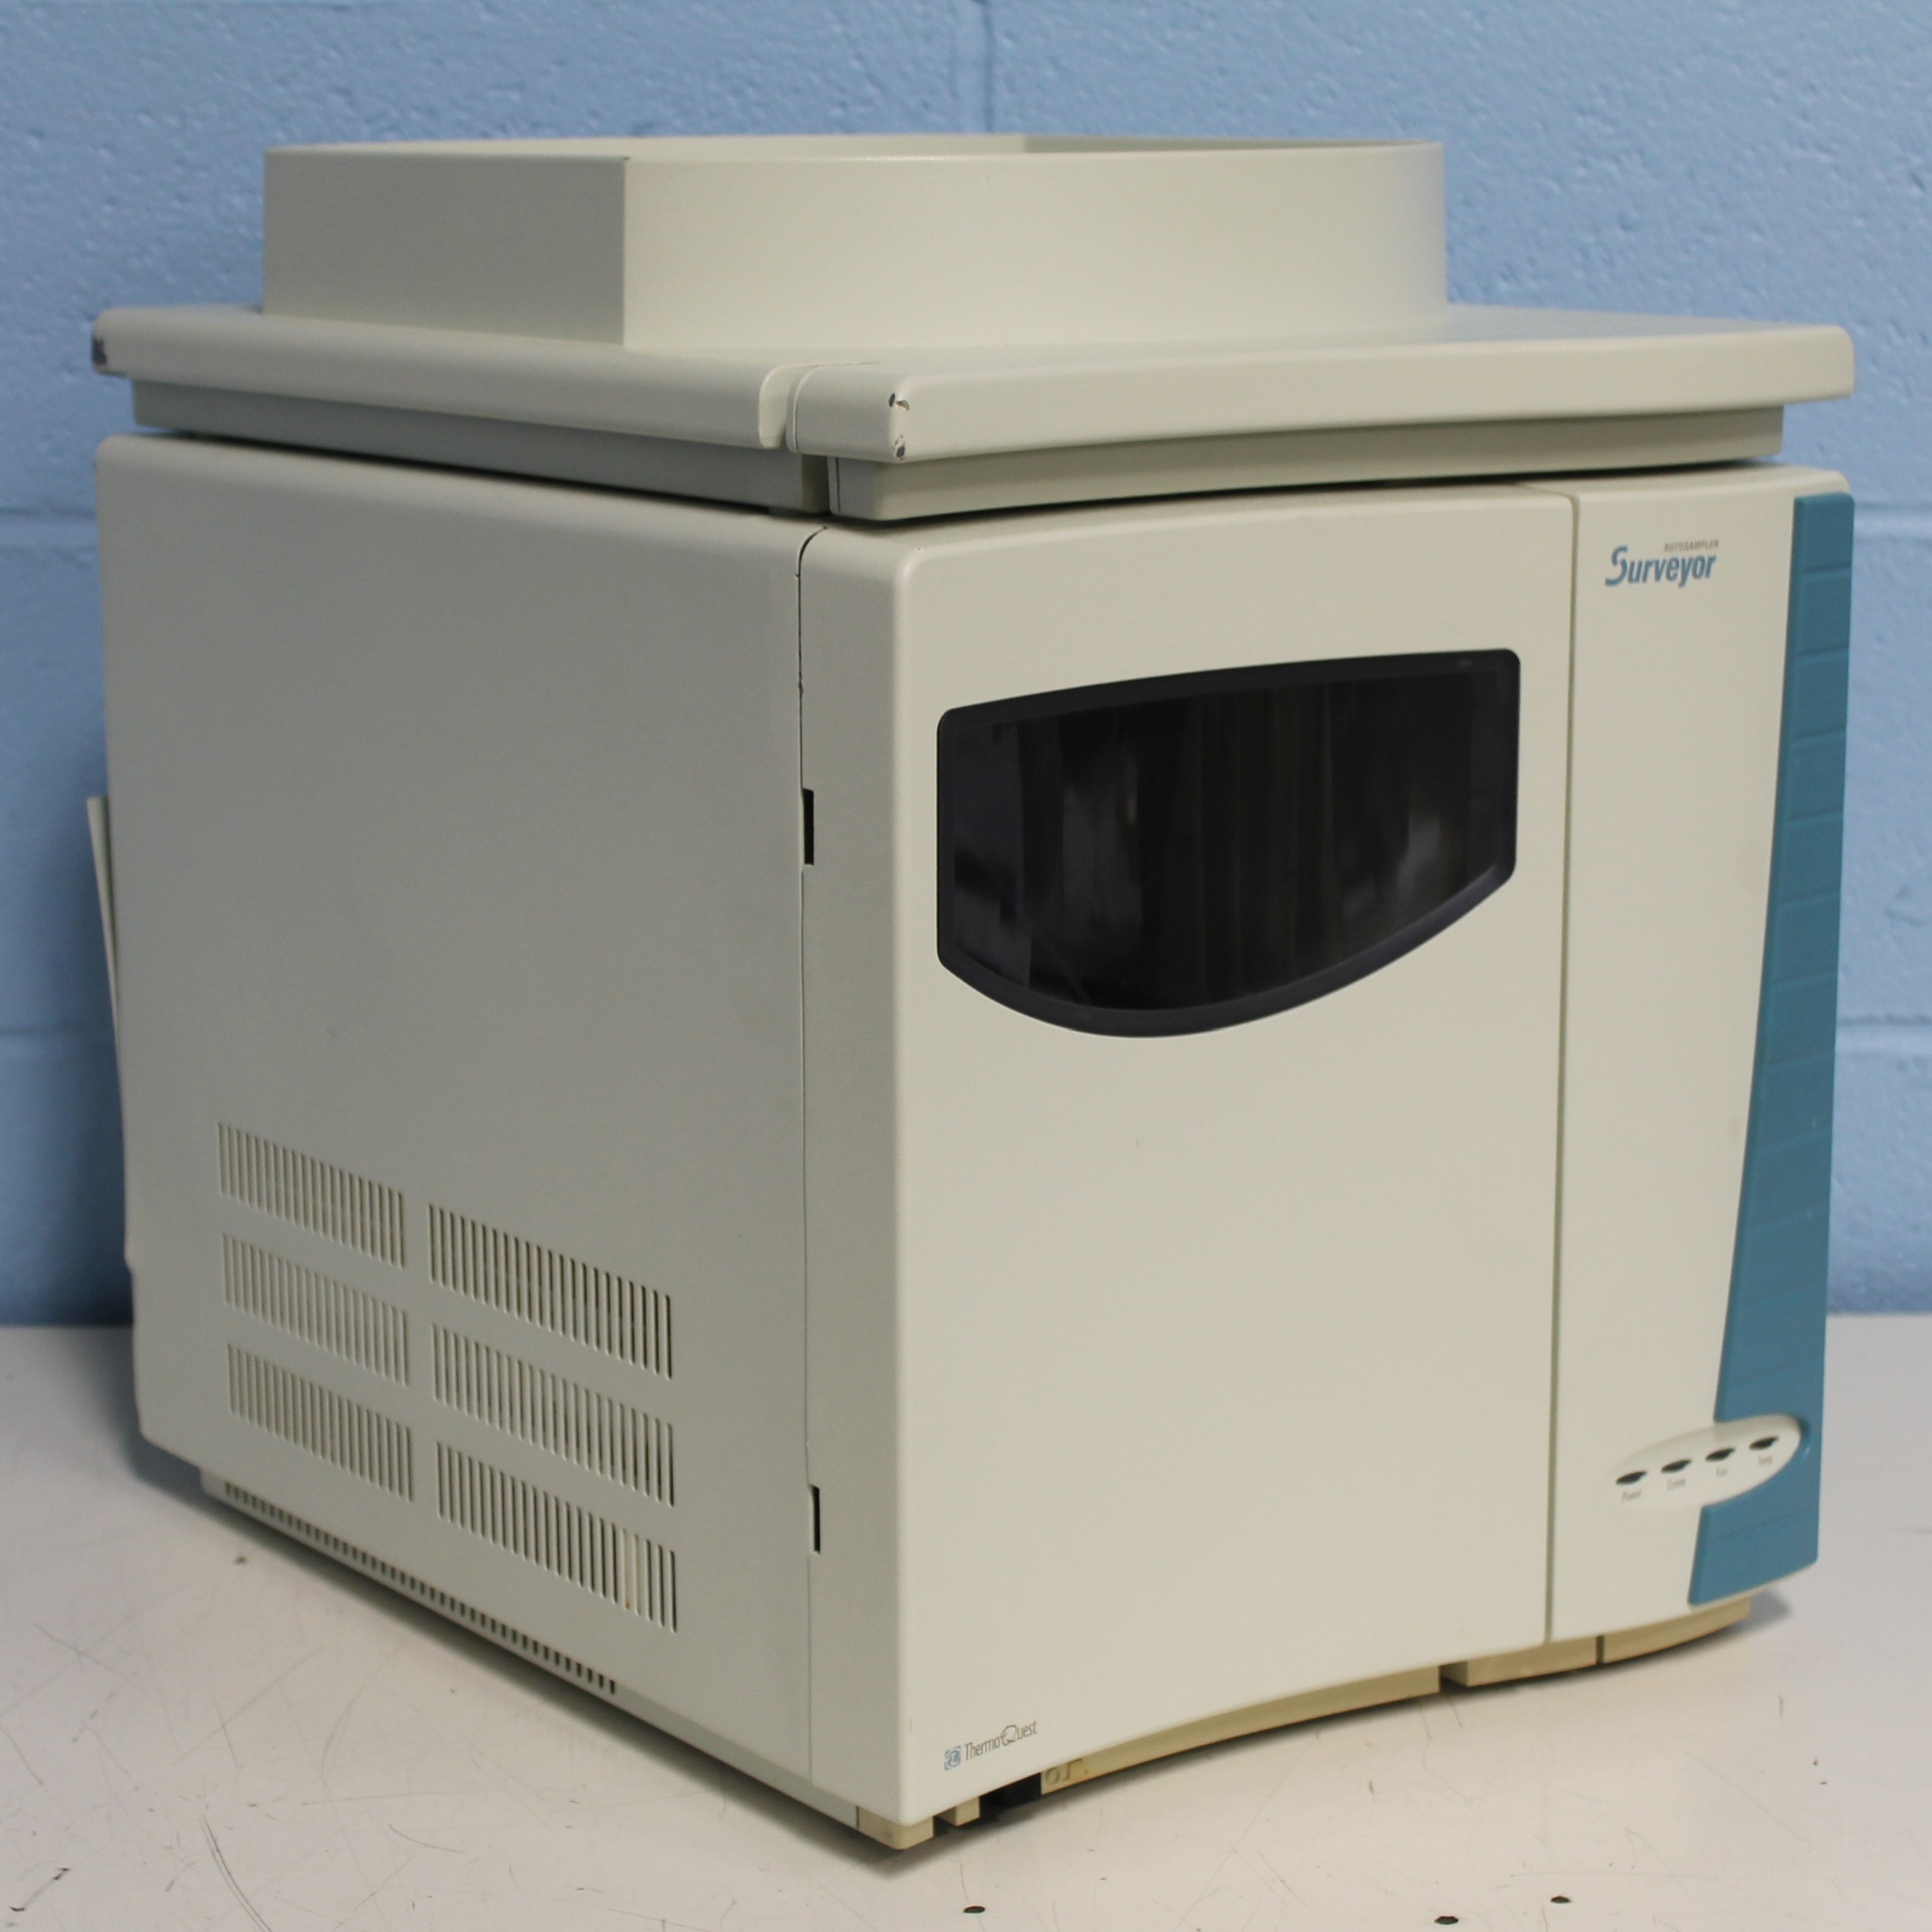 Thermo Surveyor Autosampler P/N SRVYR-AS Image